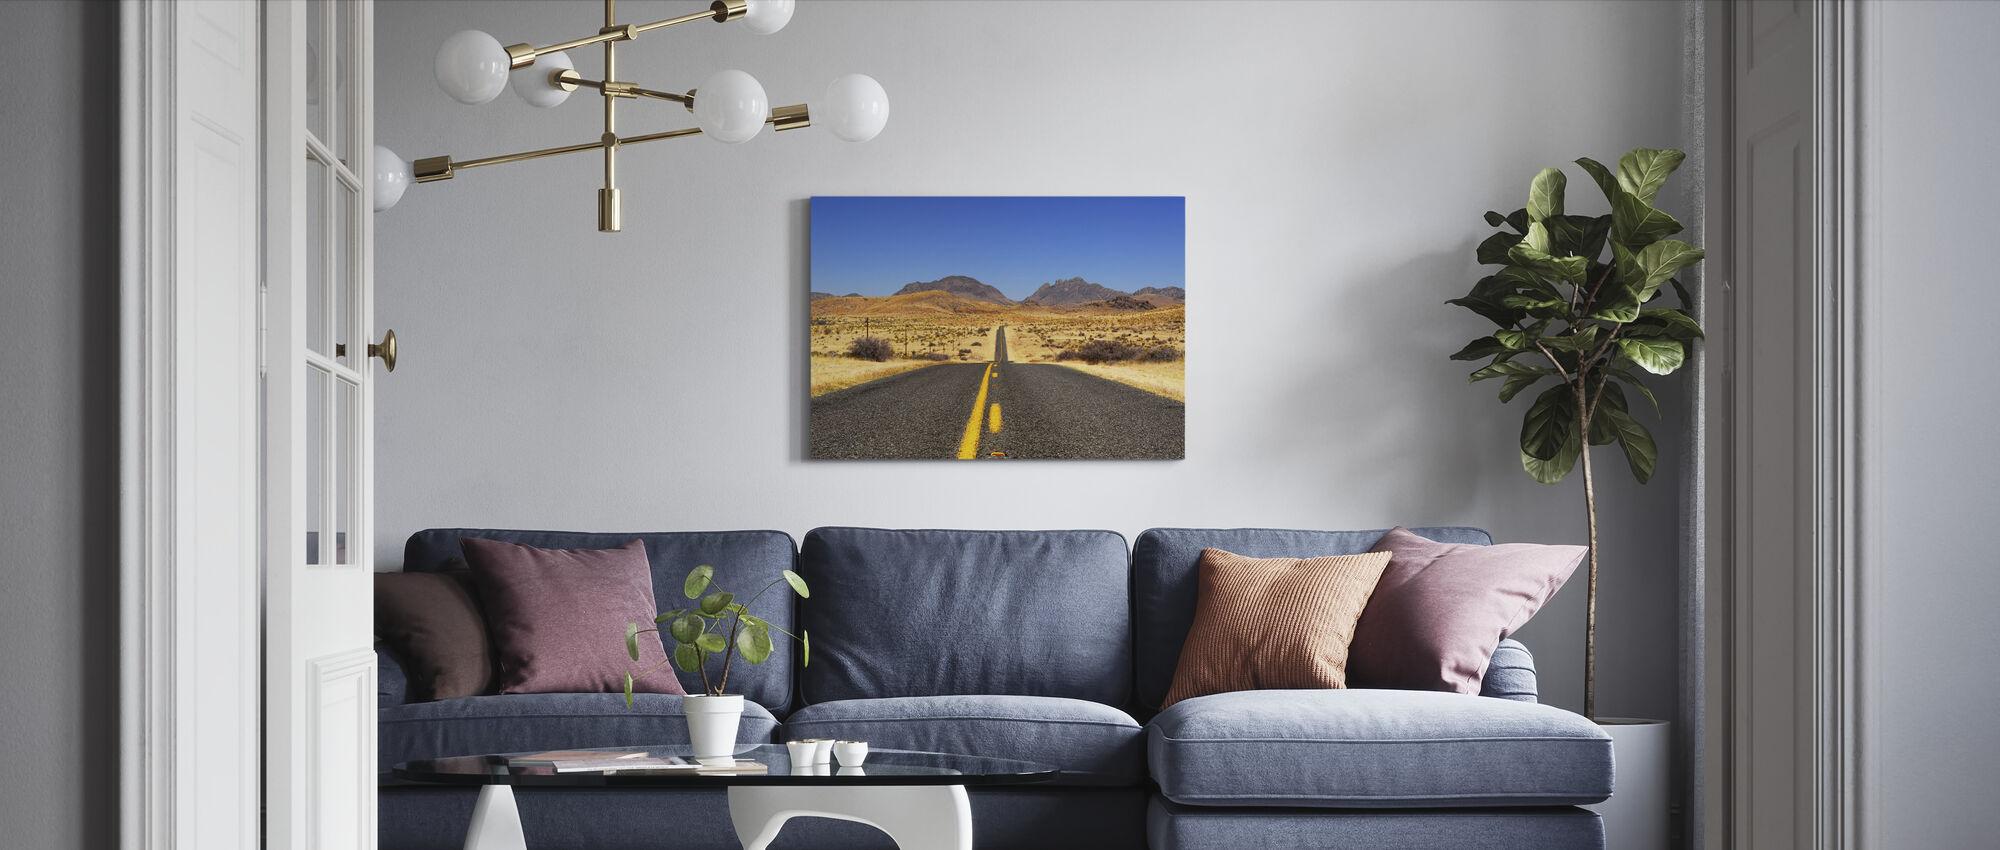 Kadonnut valtatie - Canvastaulu - Olohuone